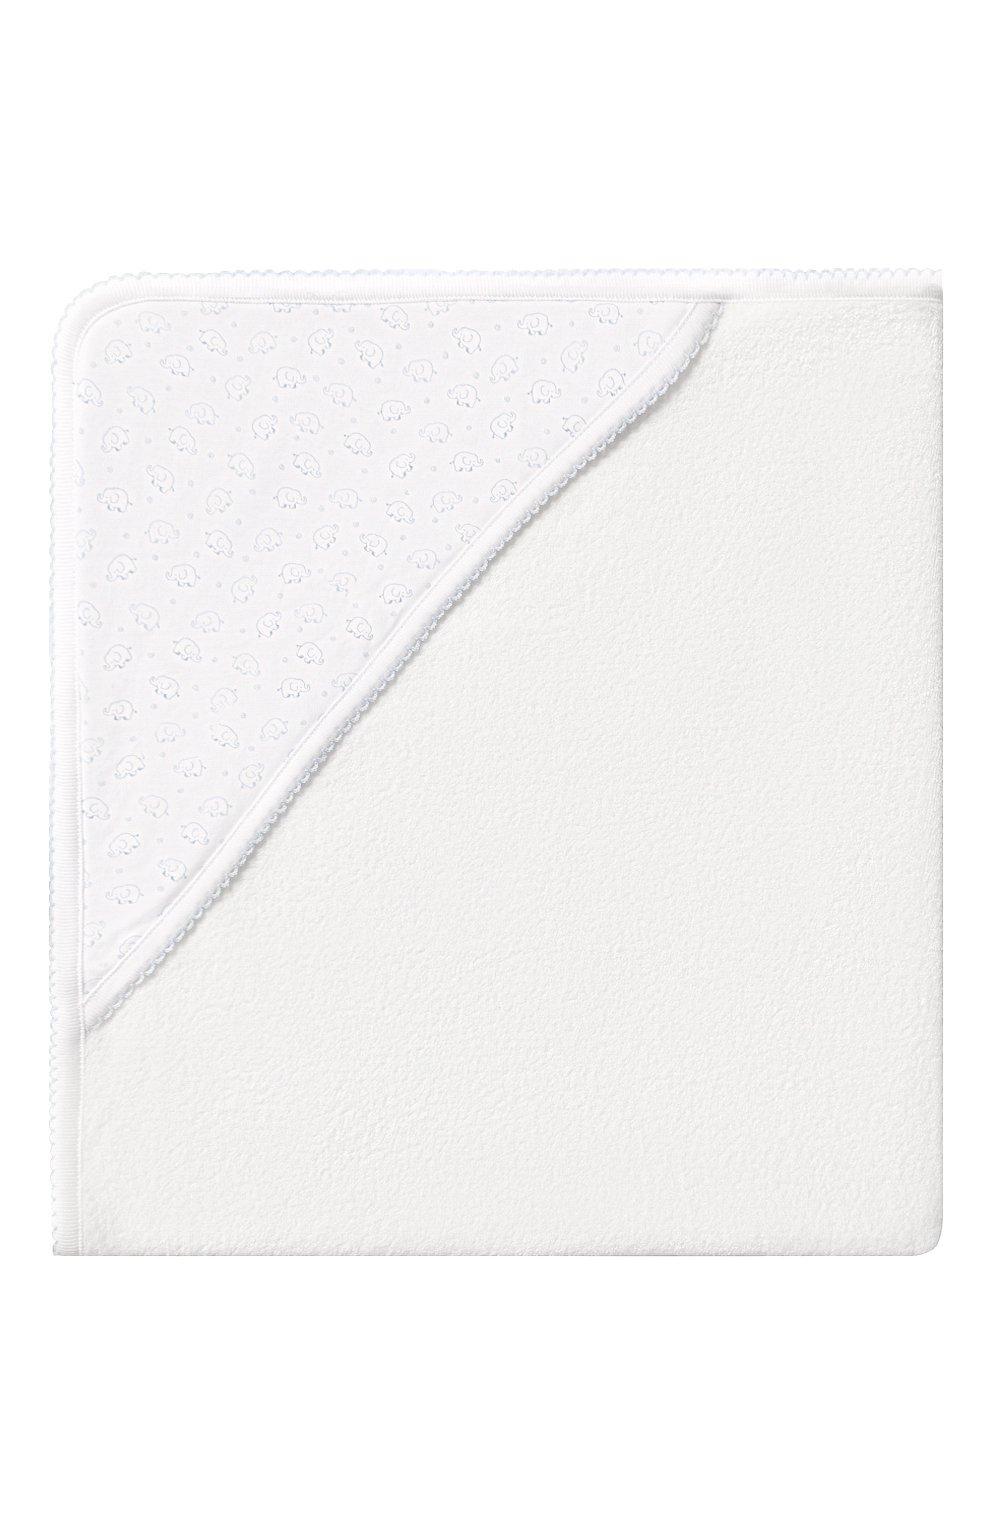 Детского комплект из полотенца и рукавицы KISSY KISSY голубого цвета, арт. 48609 | Фото 5 (Материал: Текстиль, Хлопок; Статус проверки: Проверено)